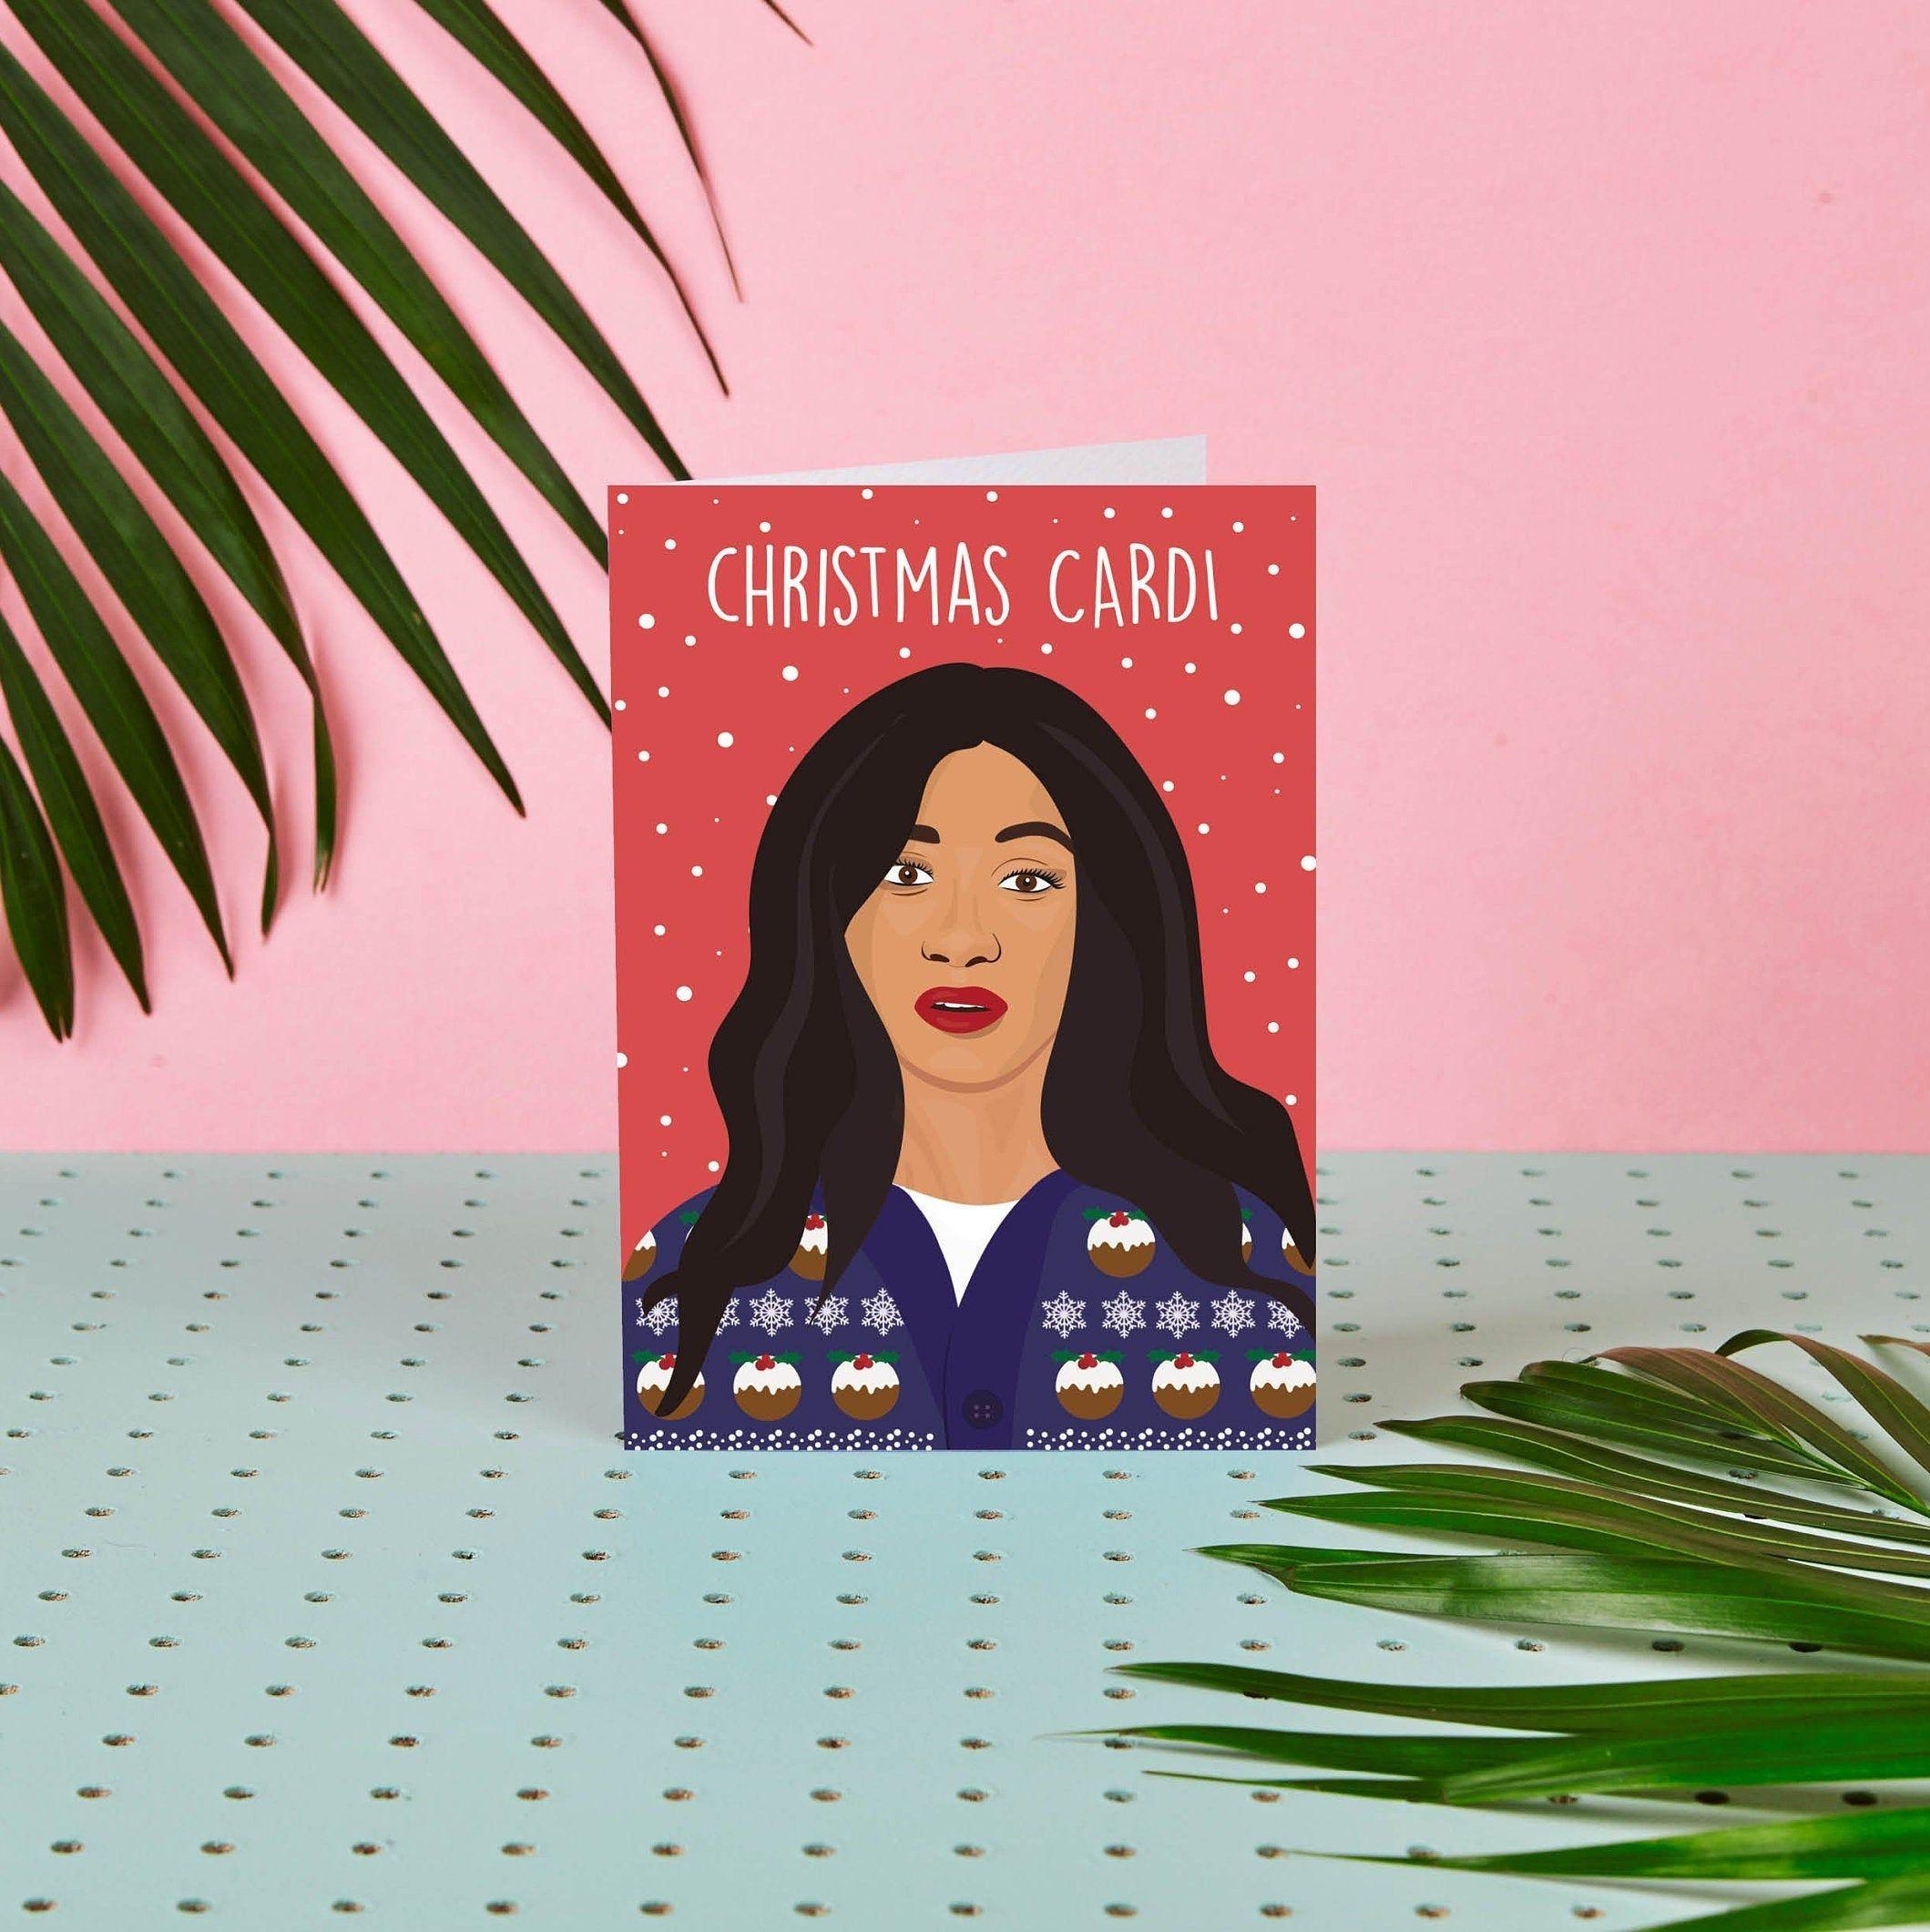 Celebrity Christmas Pics 2020 Christmas Card   Cardi B   Cardi B Greeting Card   Cardi B